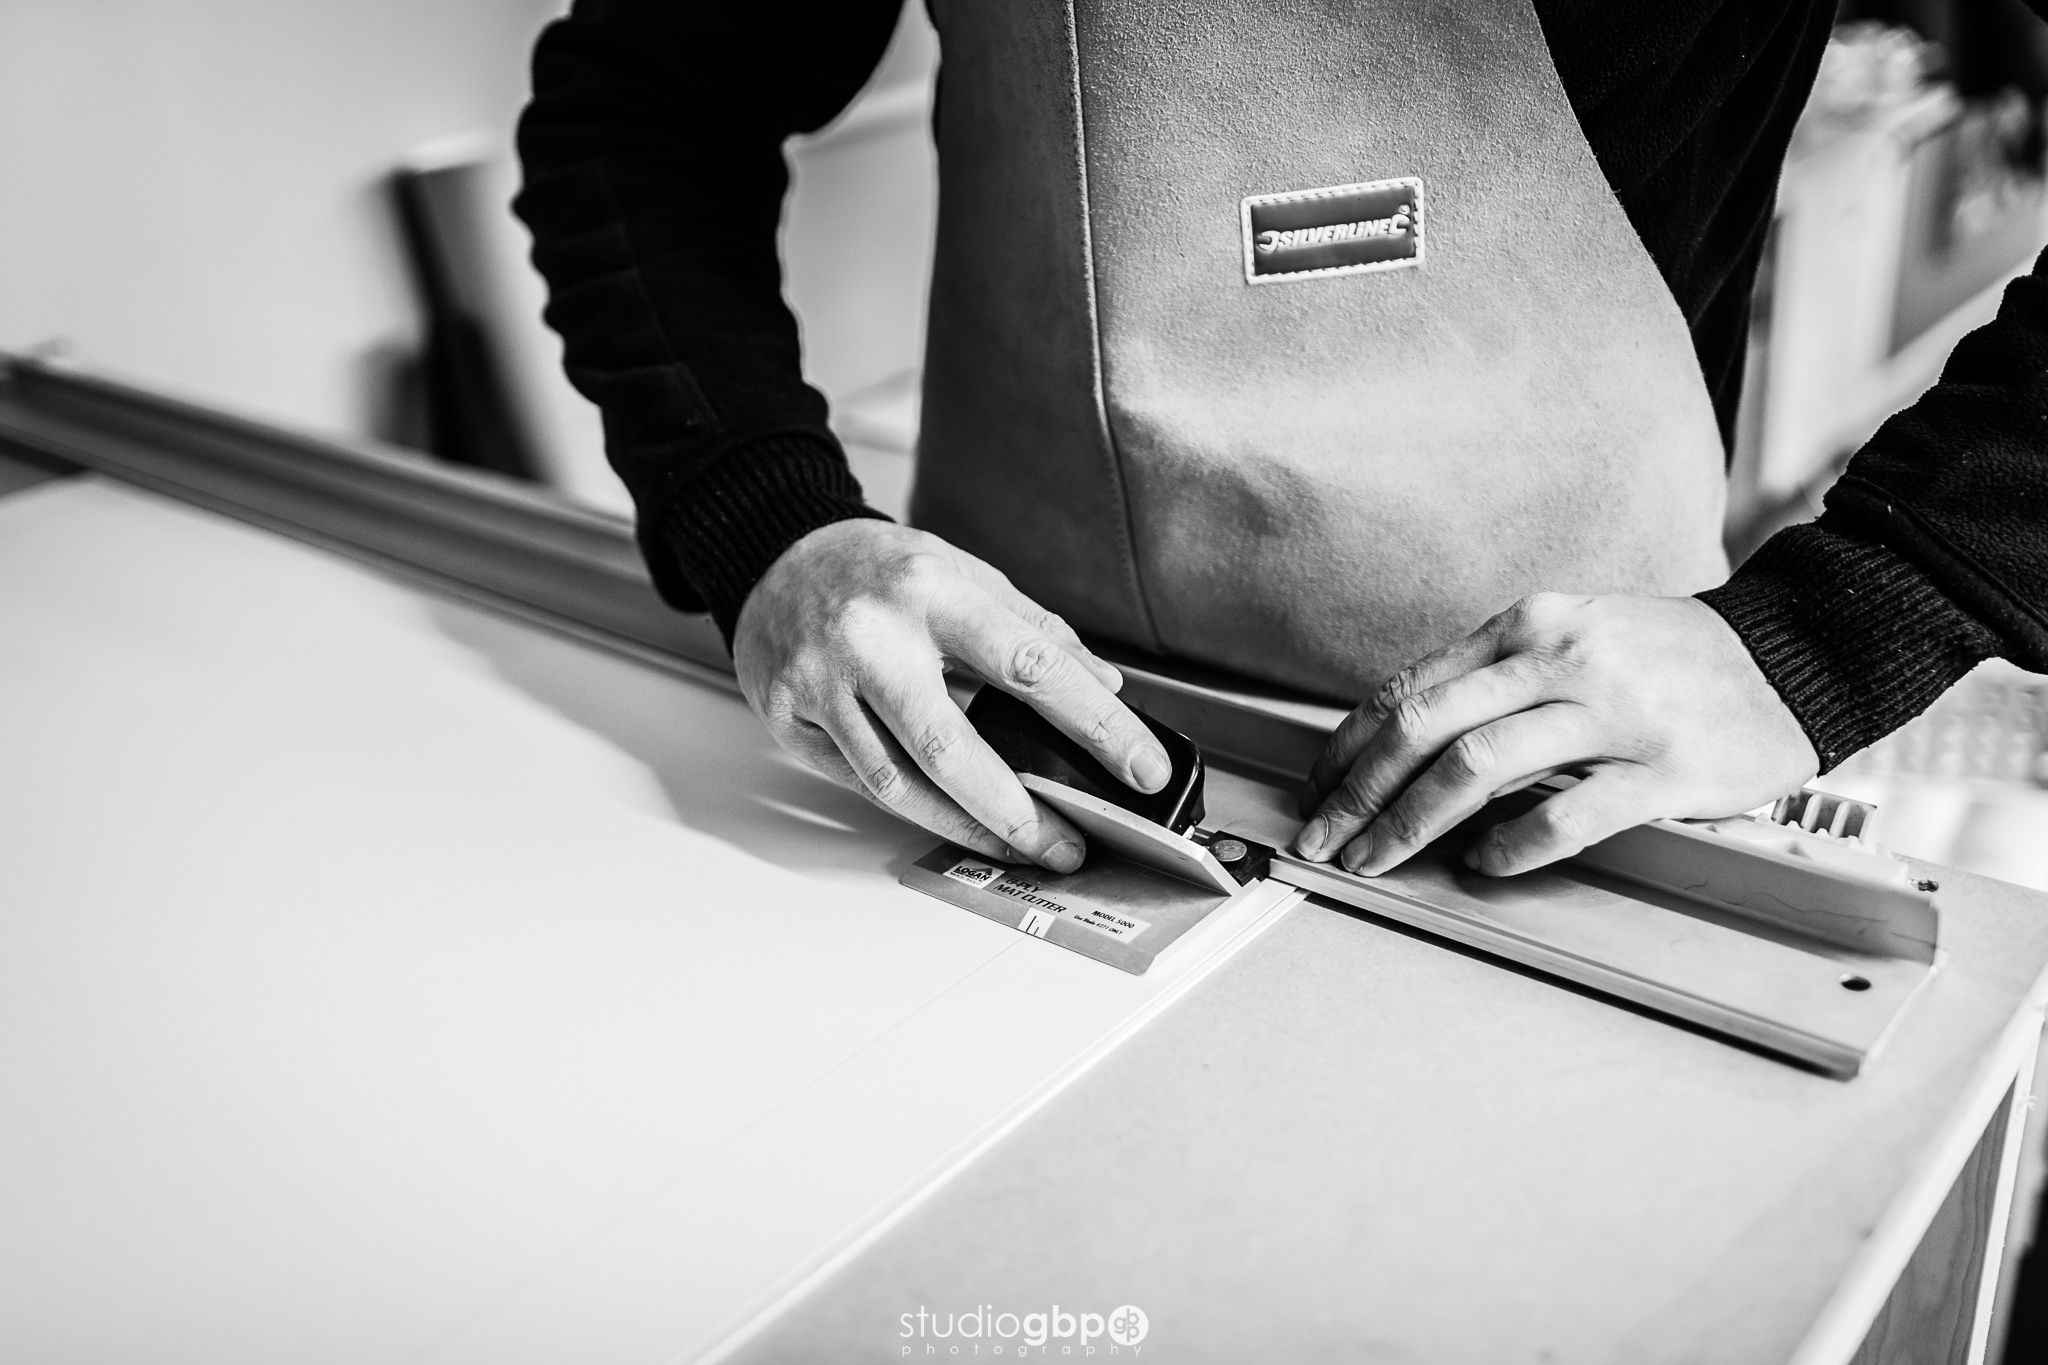 mountboard cutting